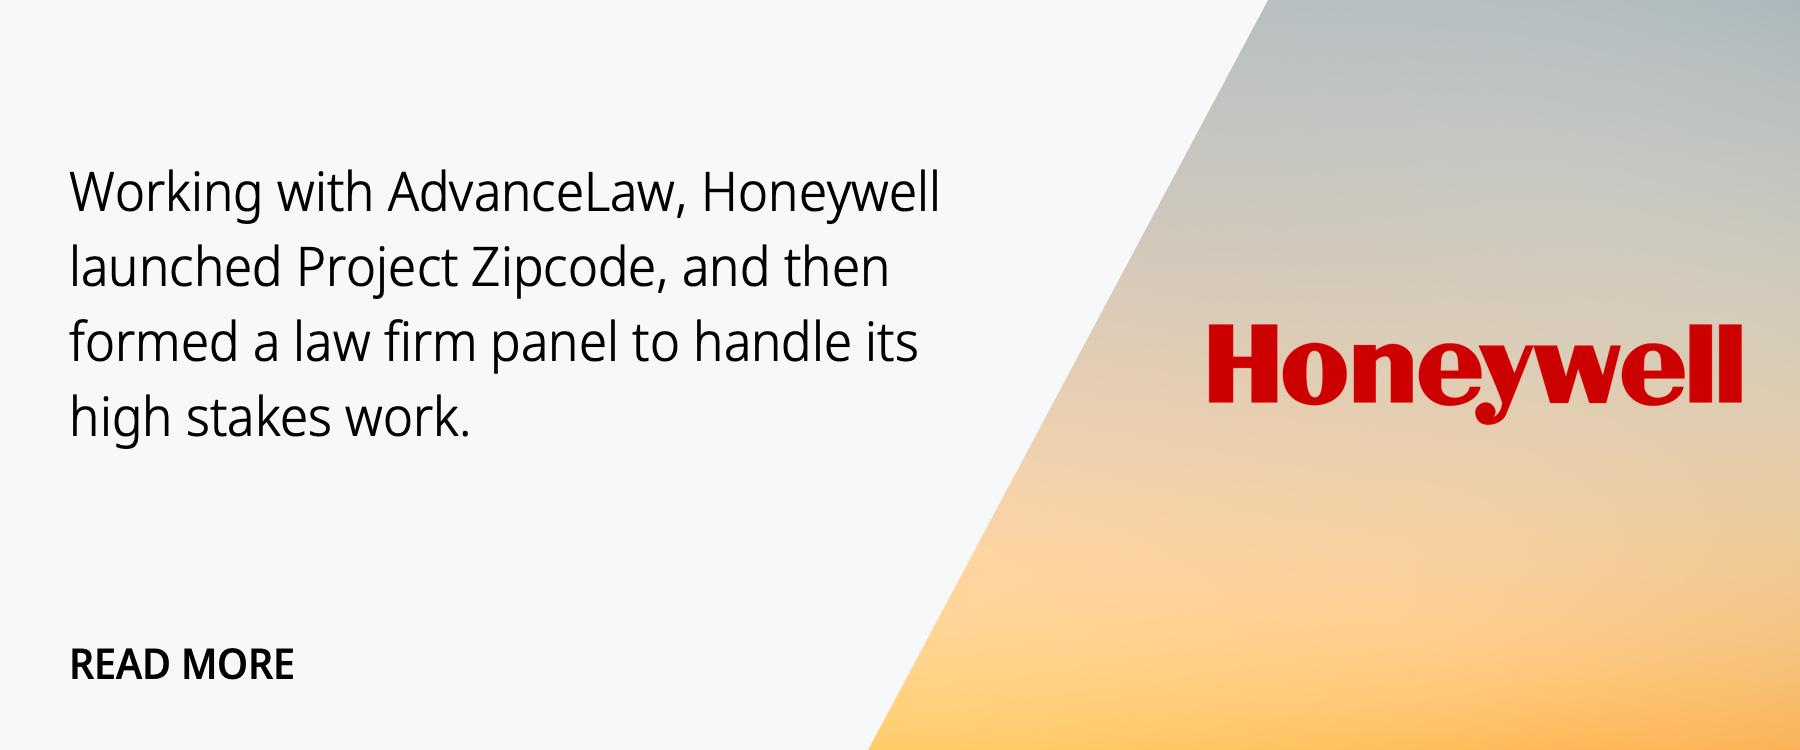 Honeywell-gradient.png